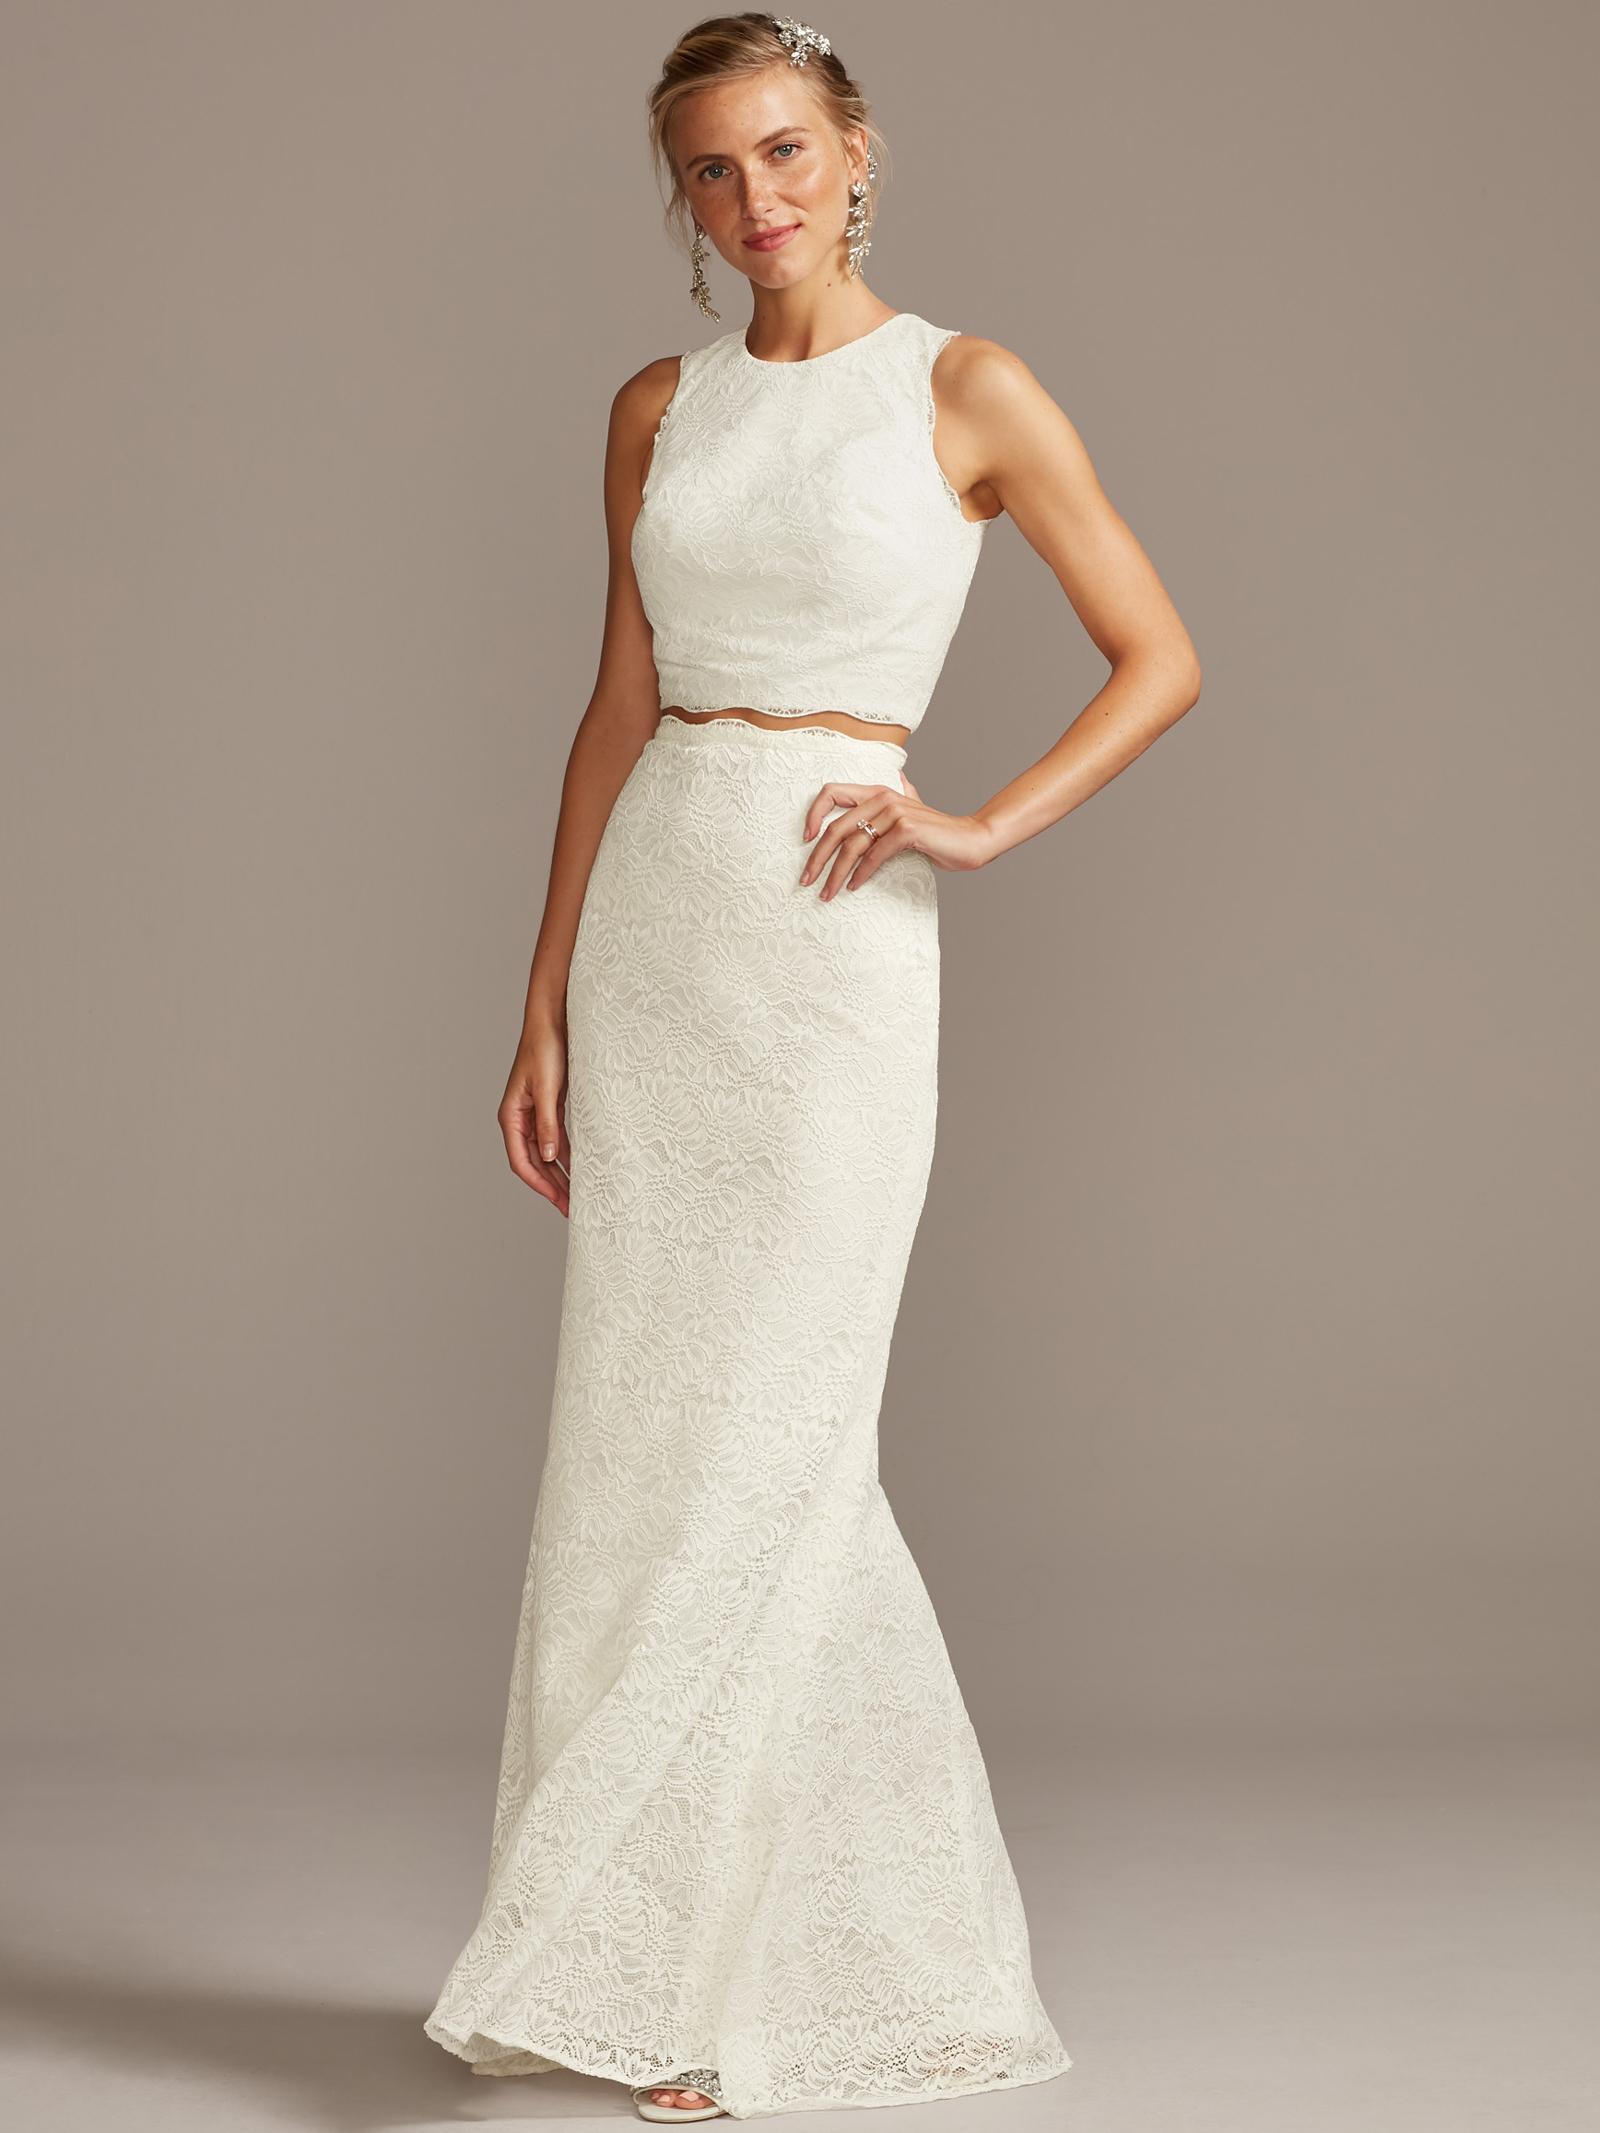 davids bridal melissa sweet two piece lace wedding dress fall 2020